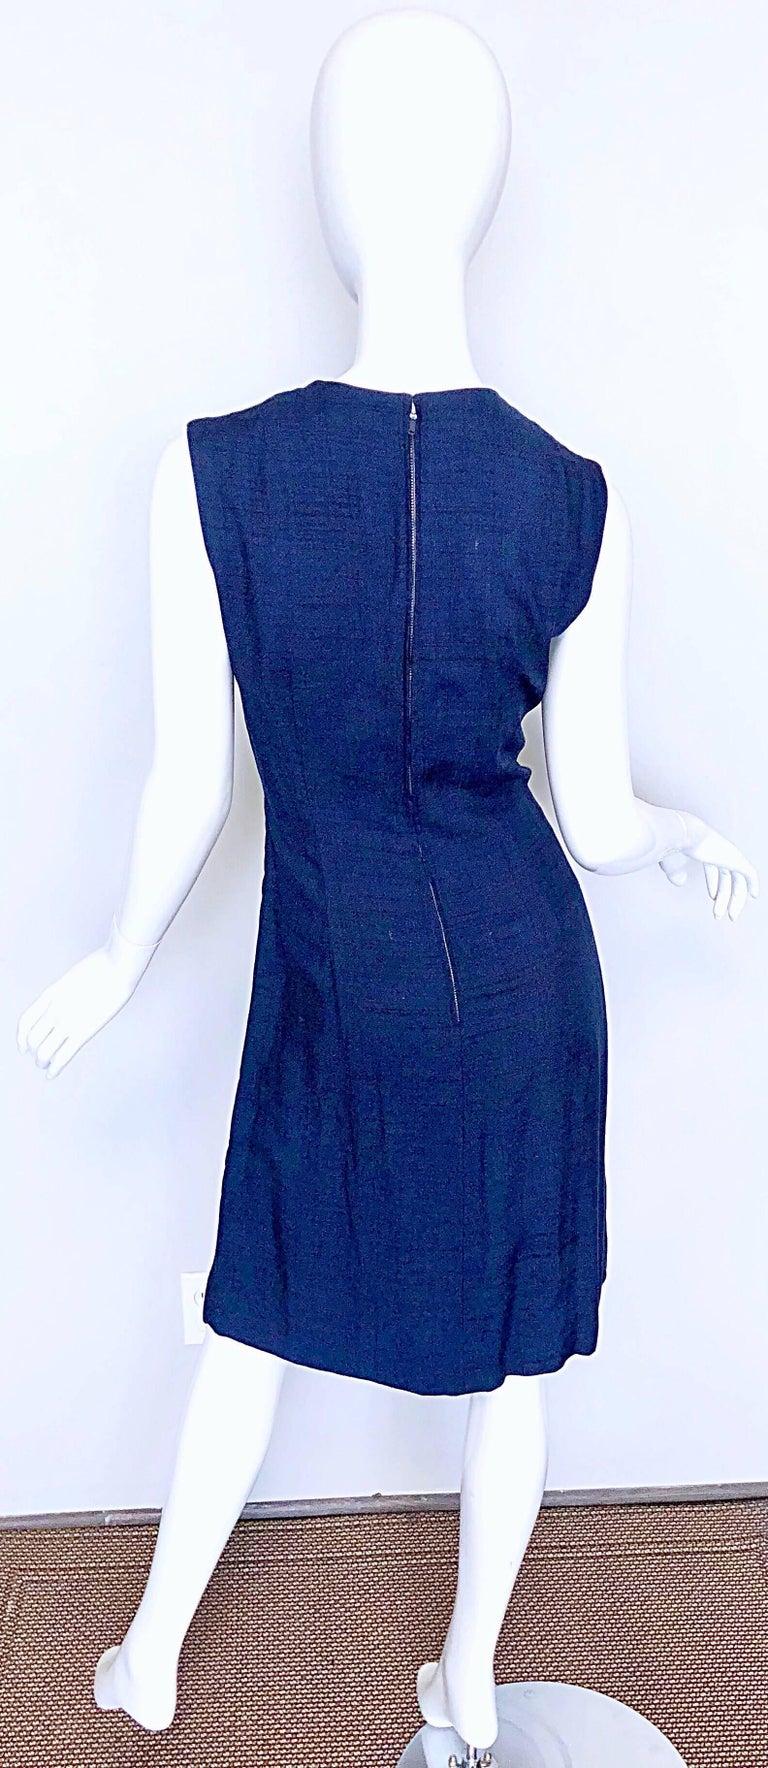 Women's Joseph Magnin 1960s Navy Blue + Red Linen Silk Nautical Vintage 60s Shift Dress For Sale